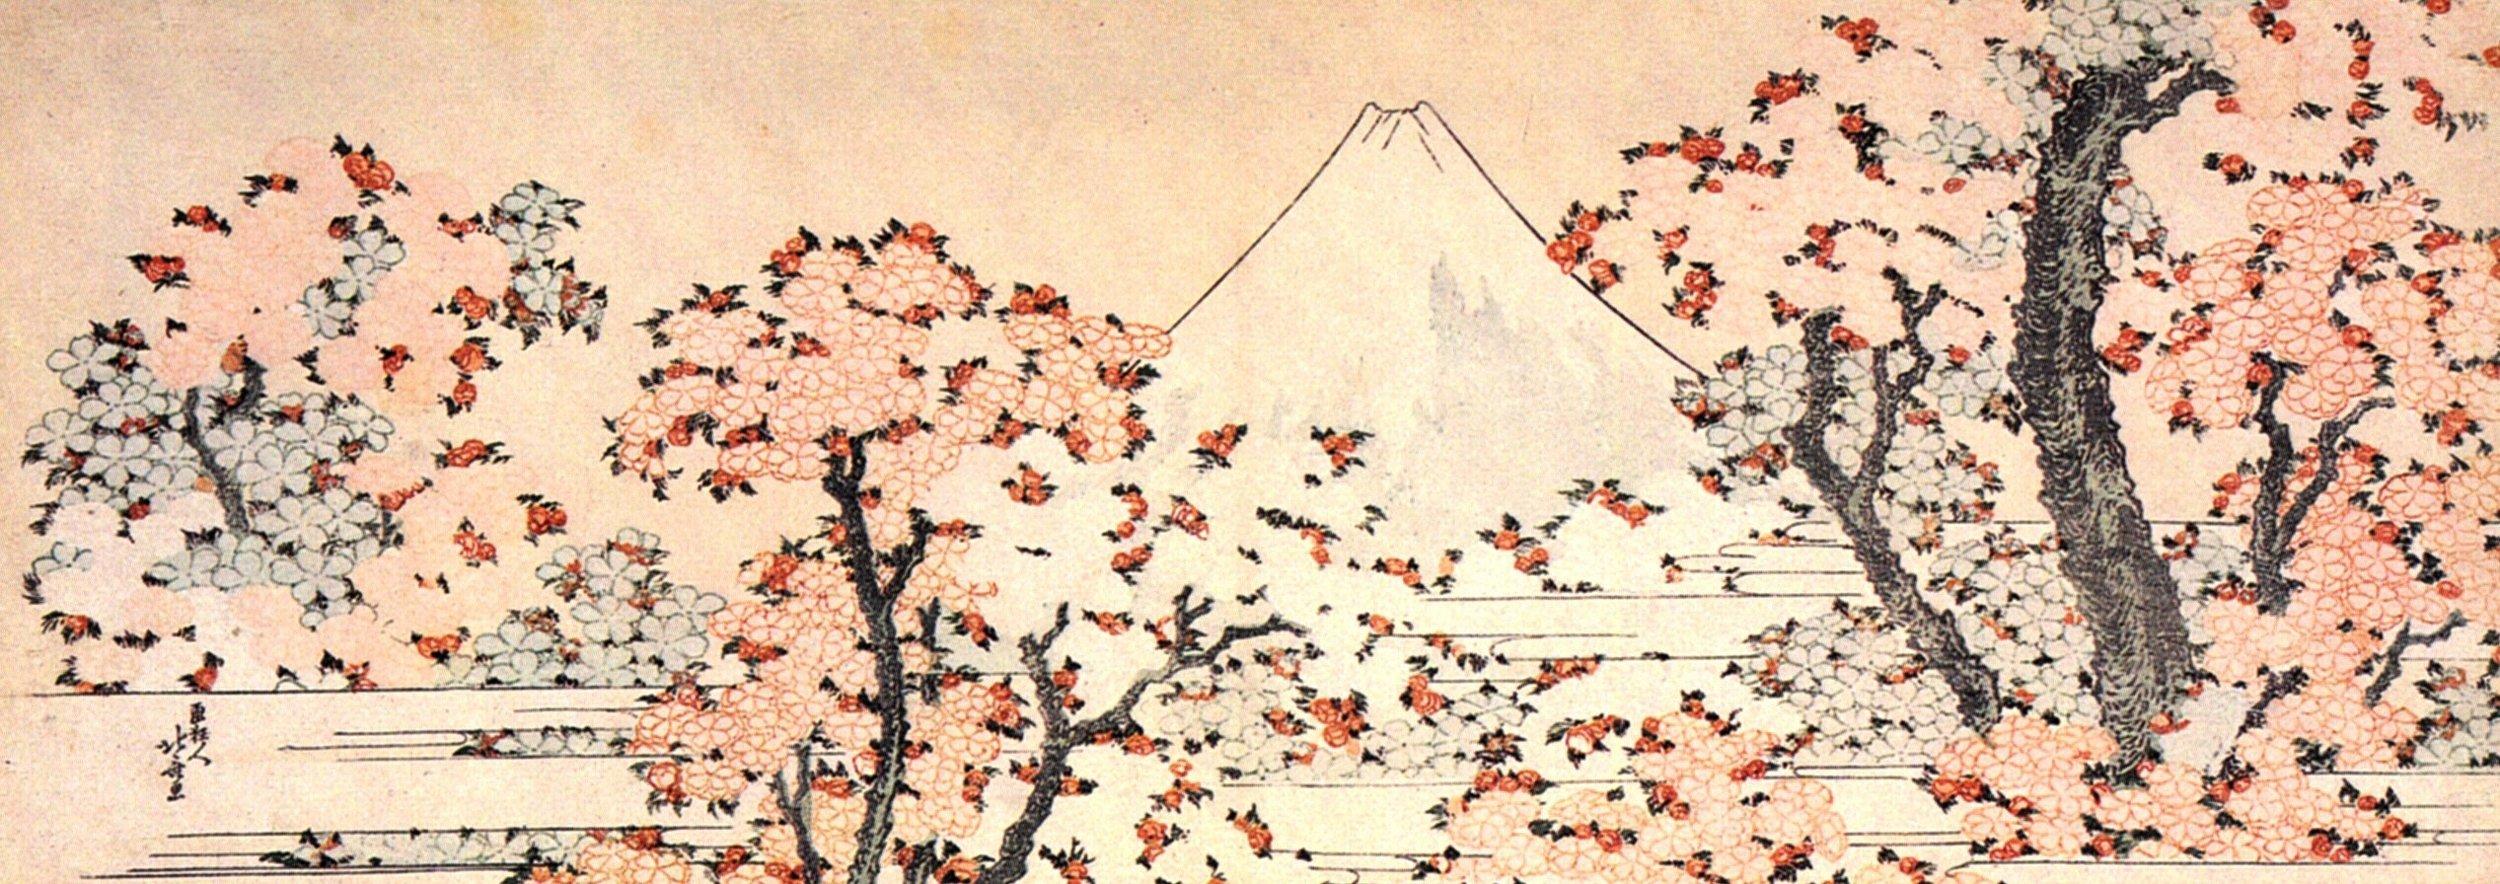 Mount Fuji seen across flowering cherries. Hokusai, c. 1802 -05. Bron: Rijksprentenkabinet, Rijksmuseum Amsterdam.